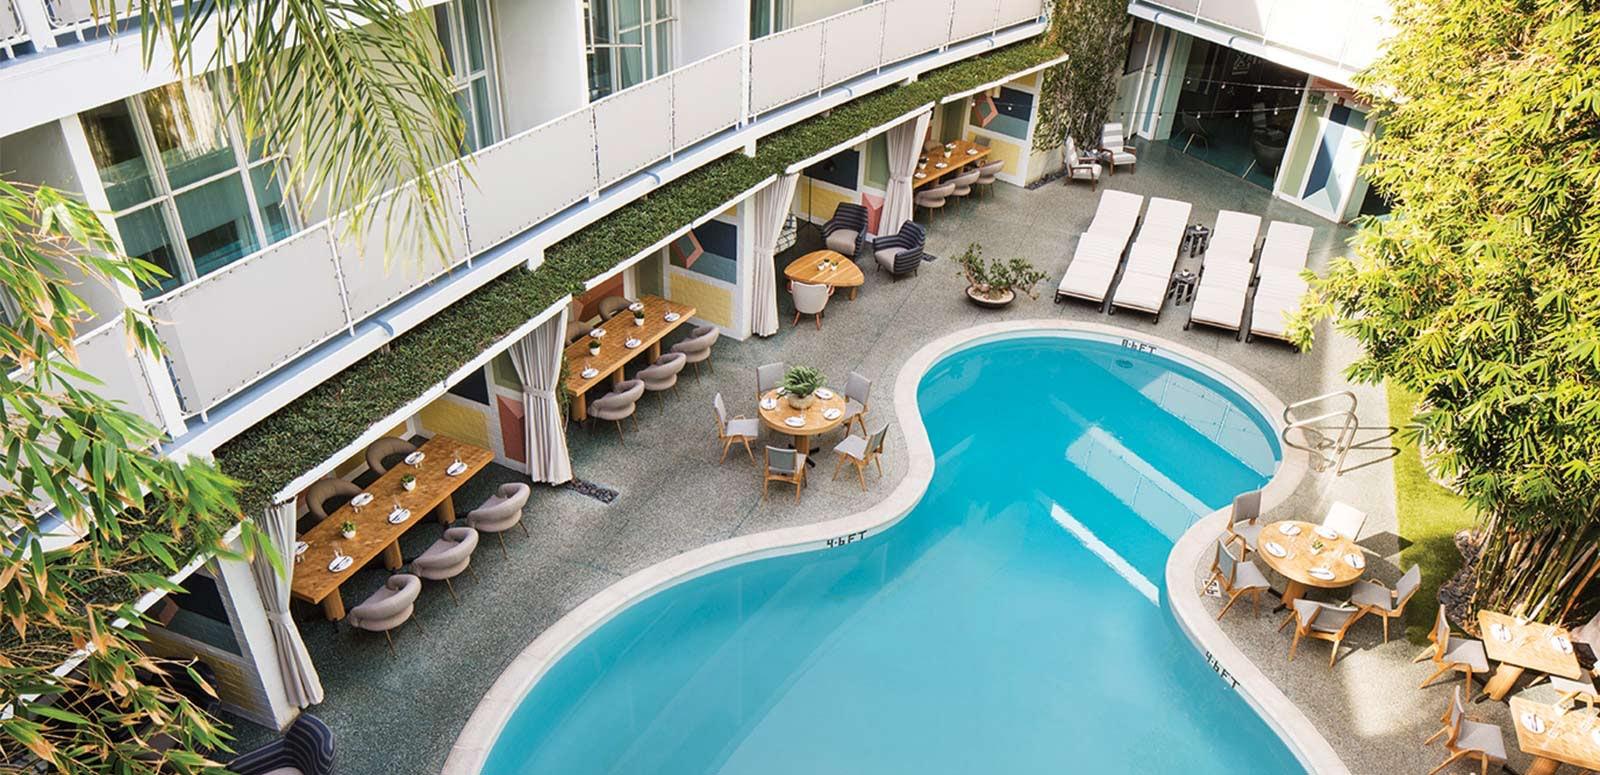 swimming pool avalon hotel